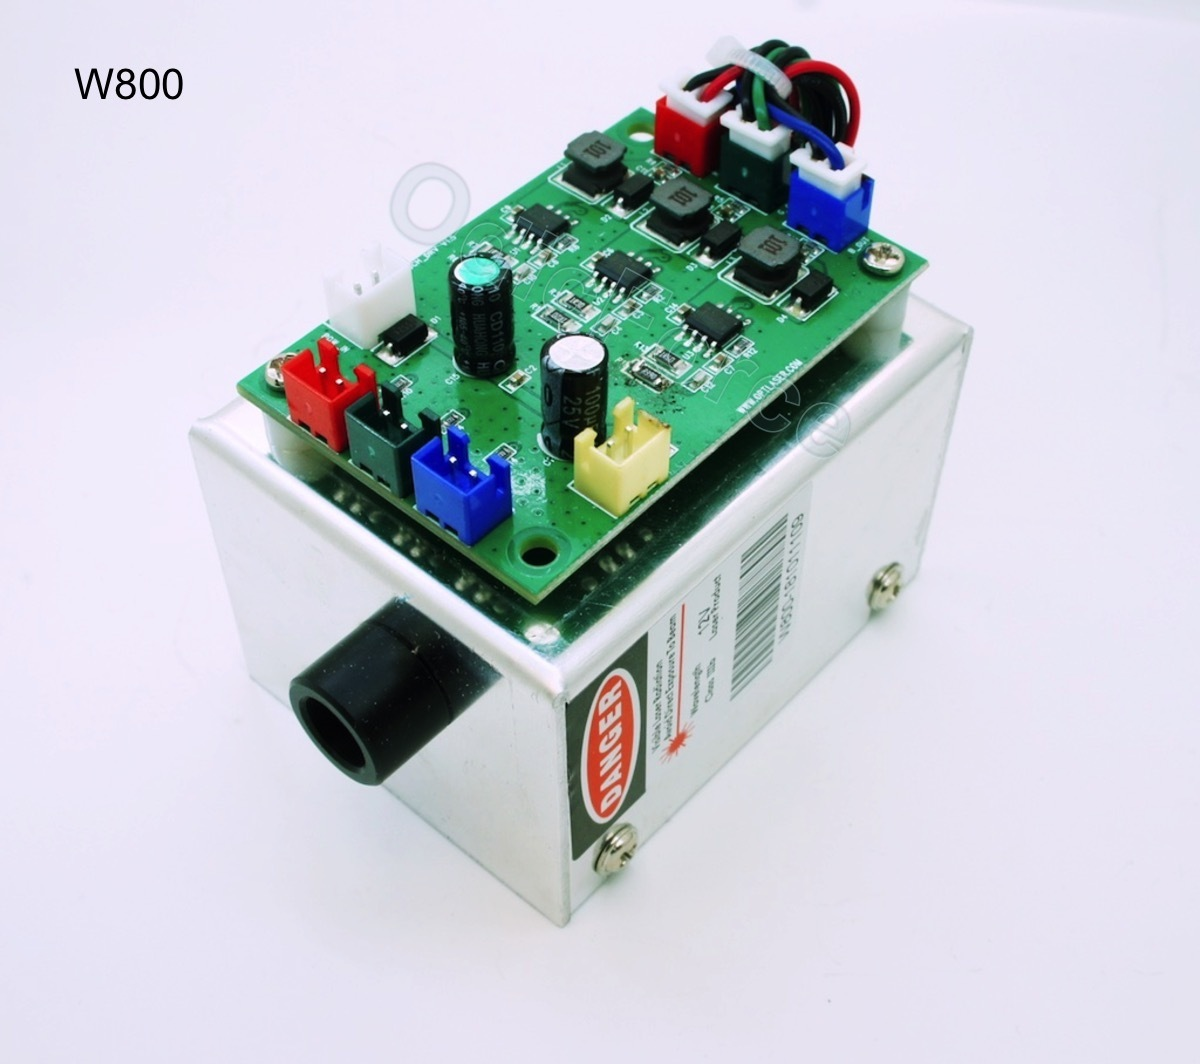 Oem 800mw Rgb Laser Chassis Ttl Modulation 12v W800